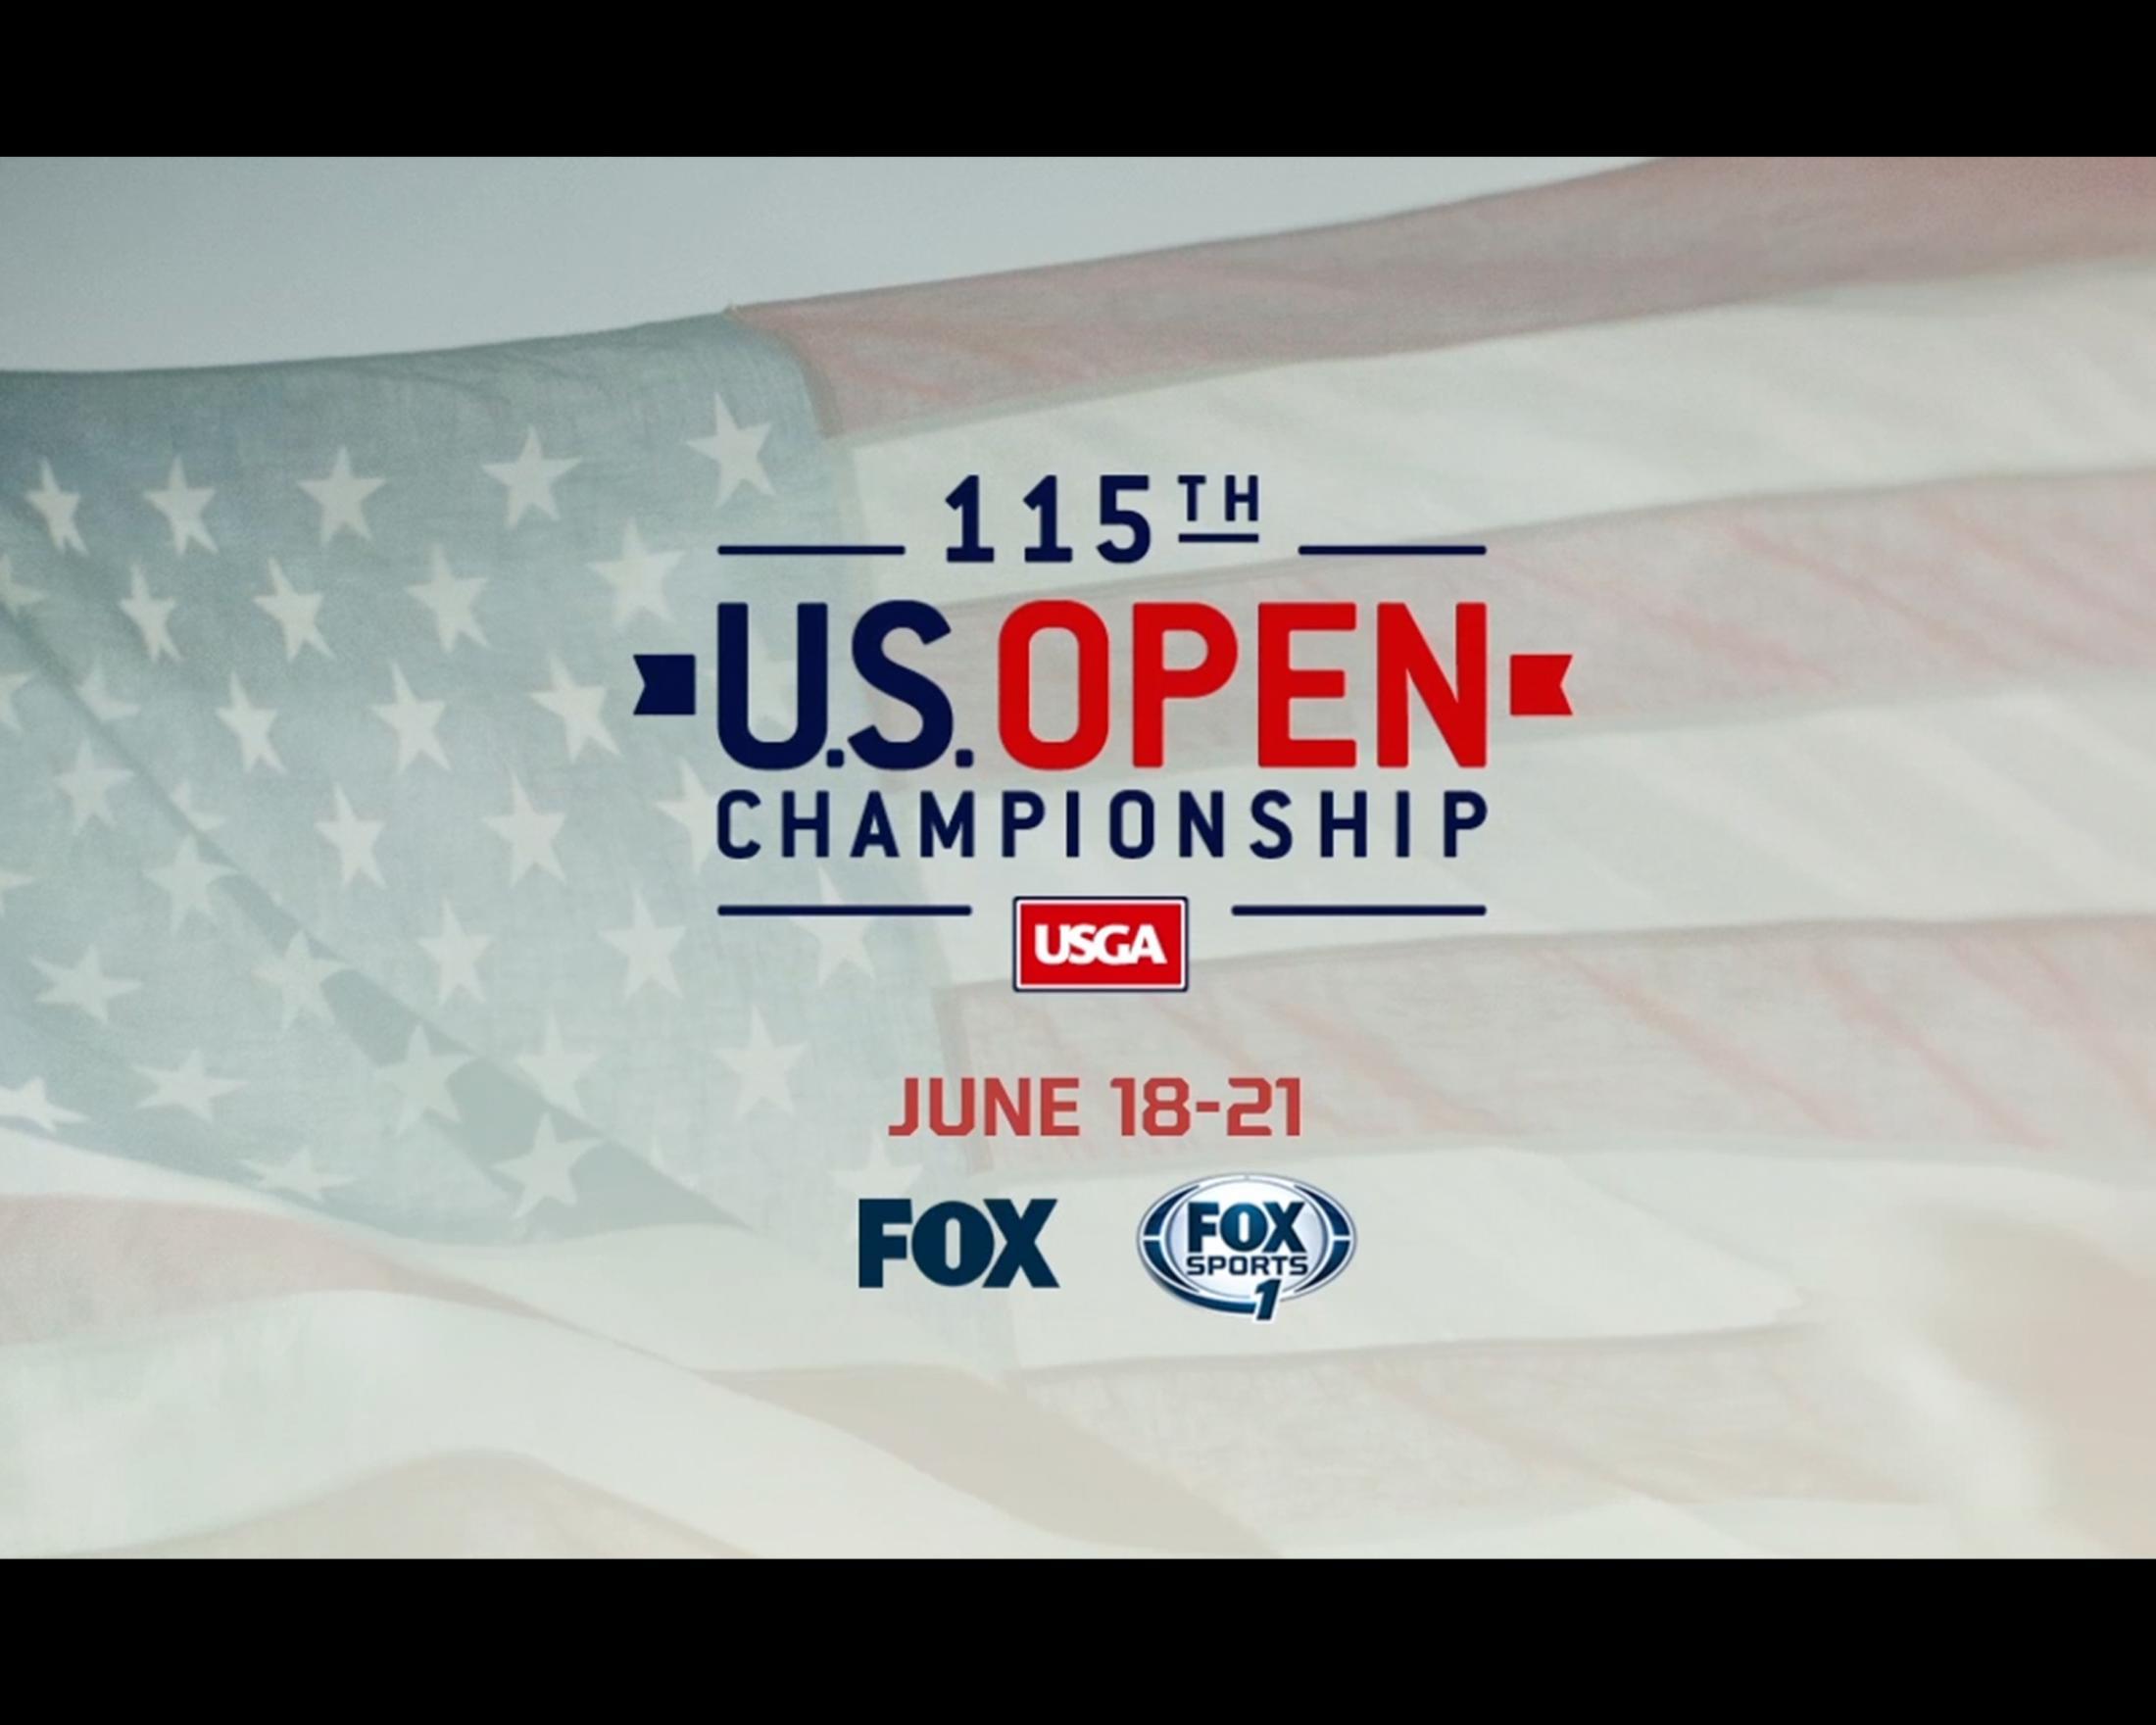 Thumbnail for U.S. Open on FOX/FS1